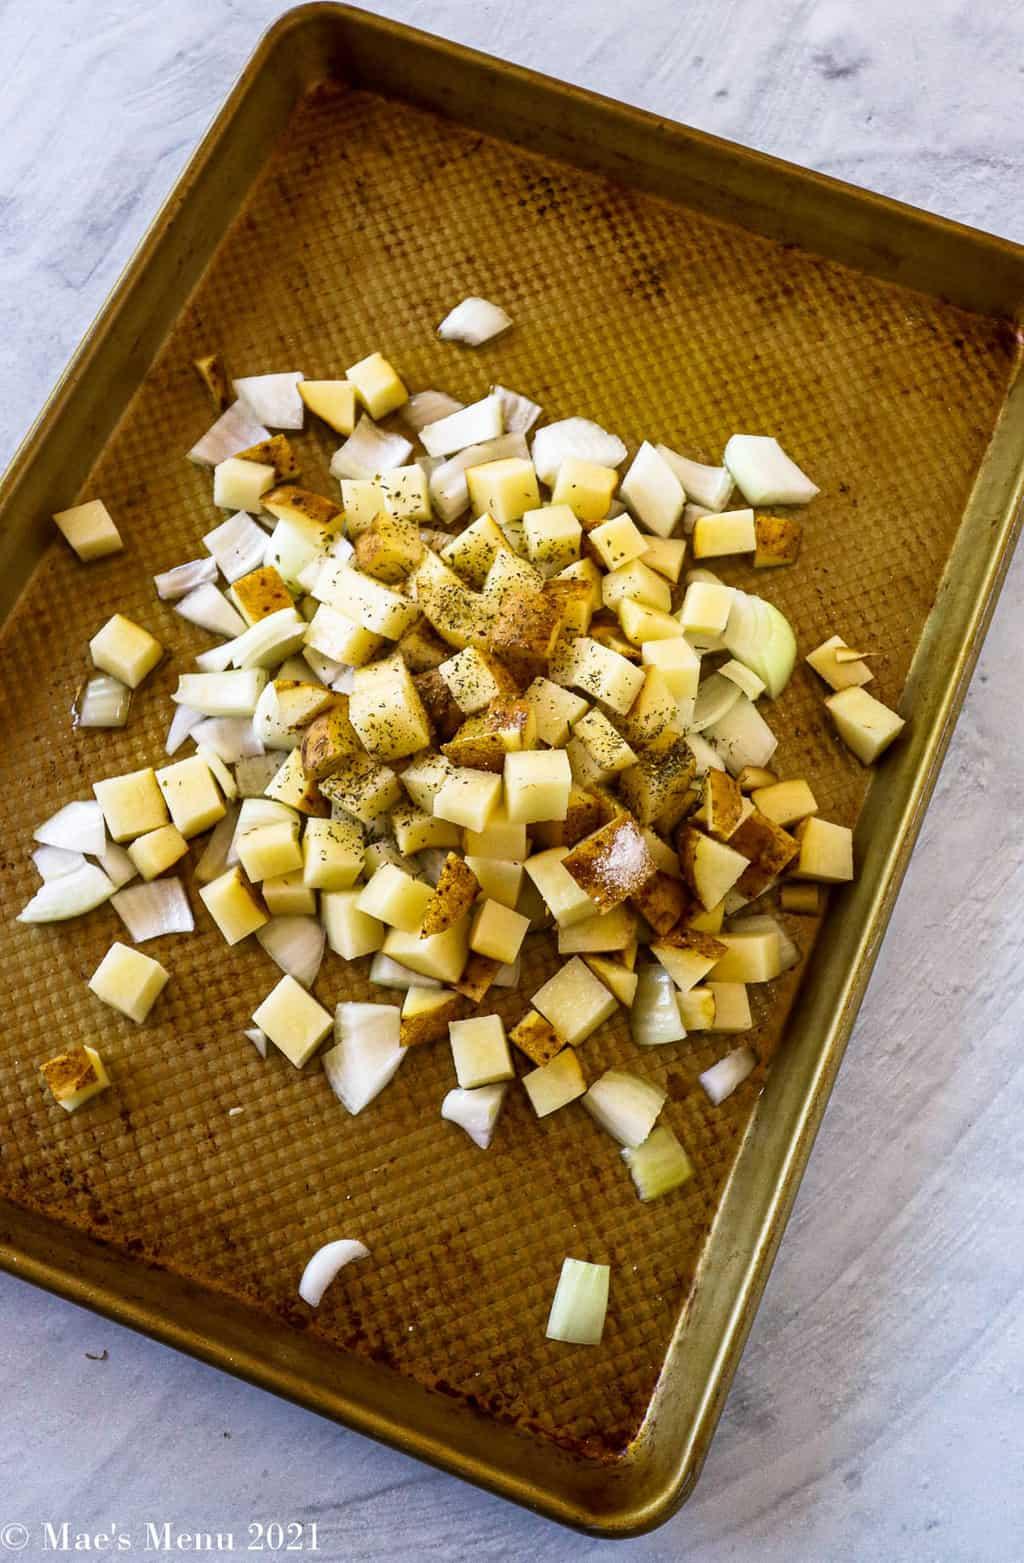 A baking pan with potatoes, onions, and seasoning